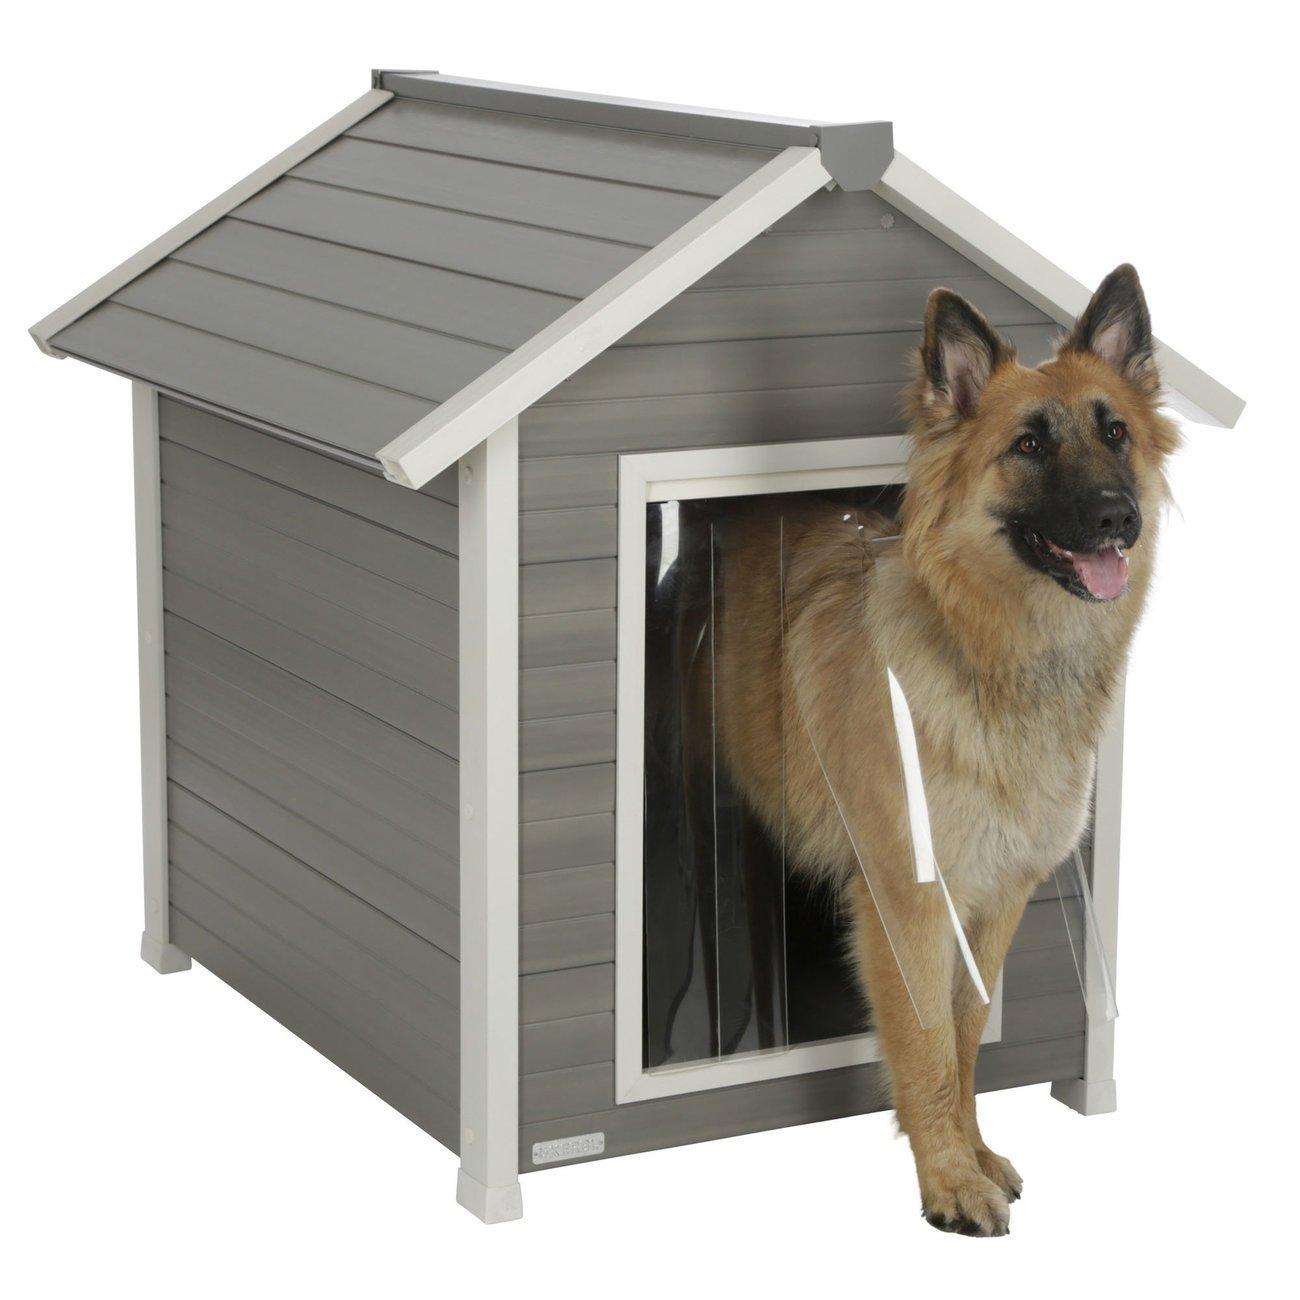 Kerbl Eco-Hundehütte Hendry, Bild 2